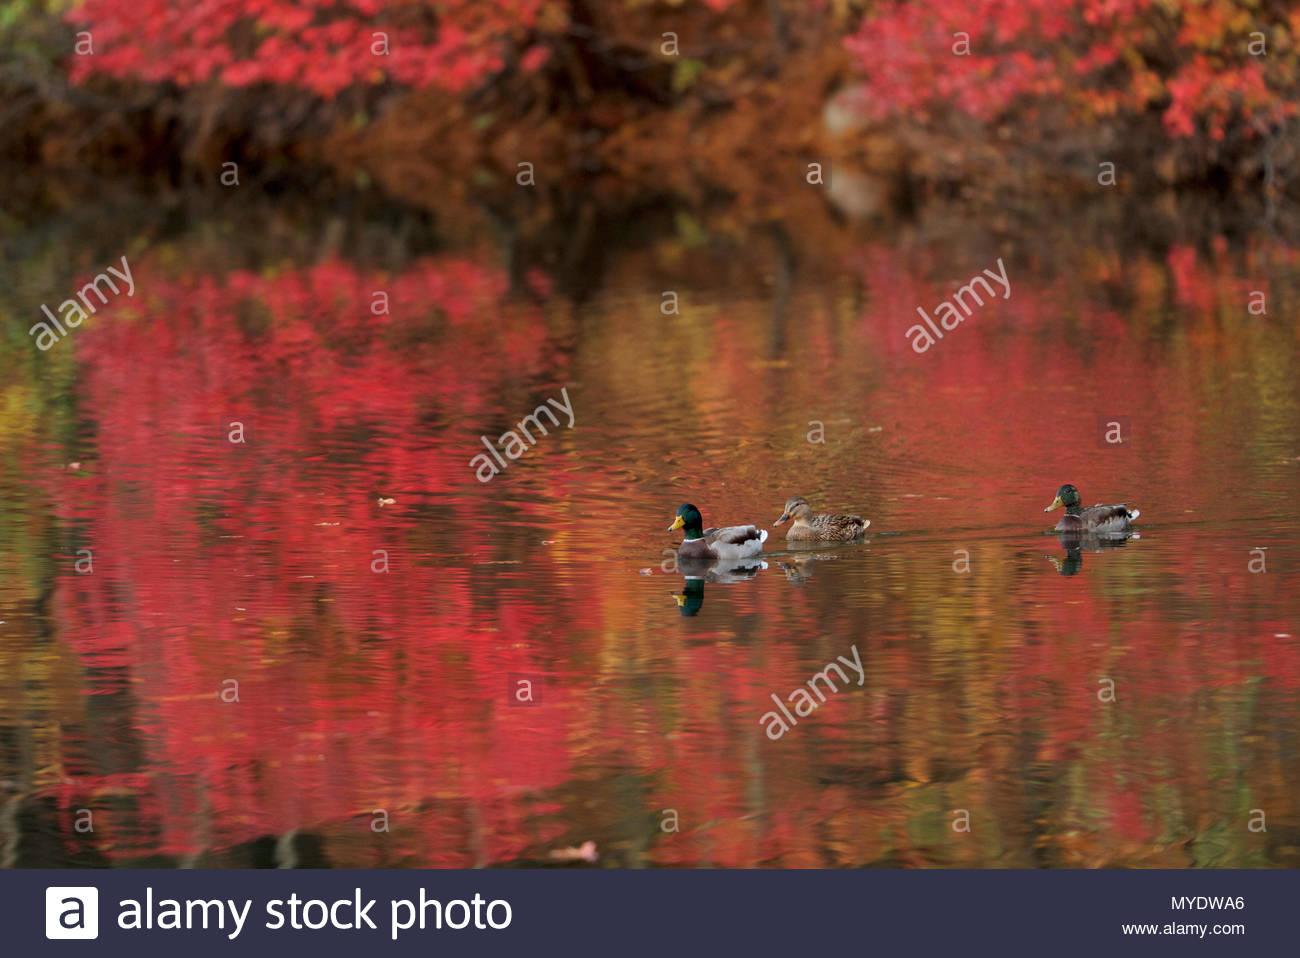 Germani reali, Anas platyrhynchos, nuotare sul Walden Pond. Immagini Stock